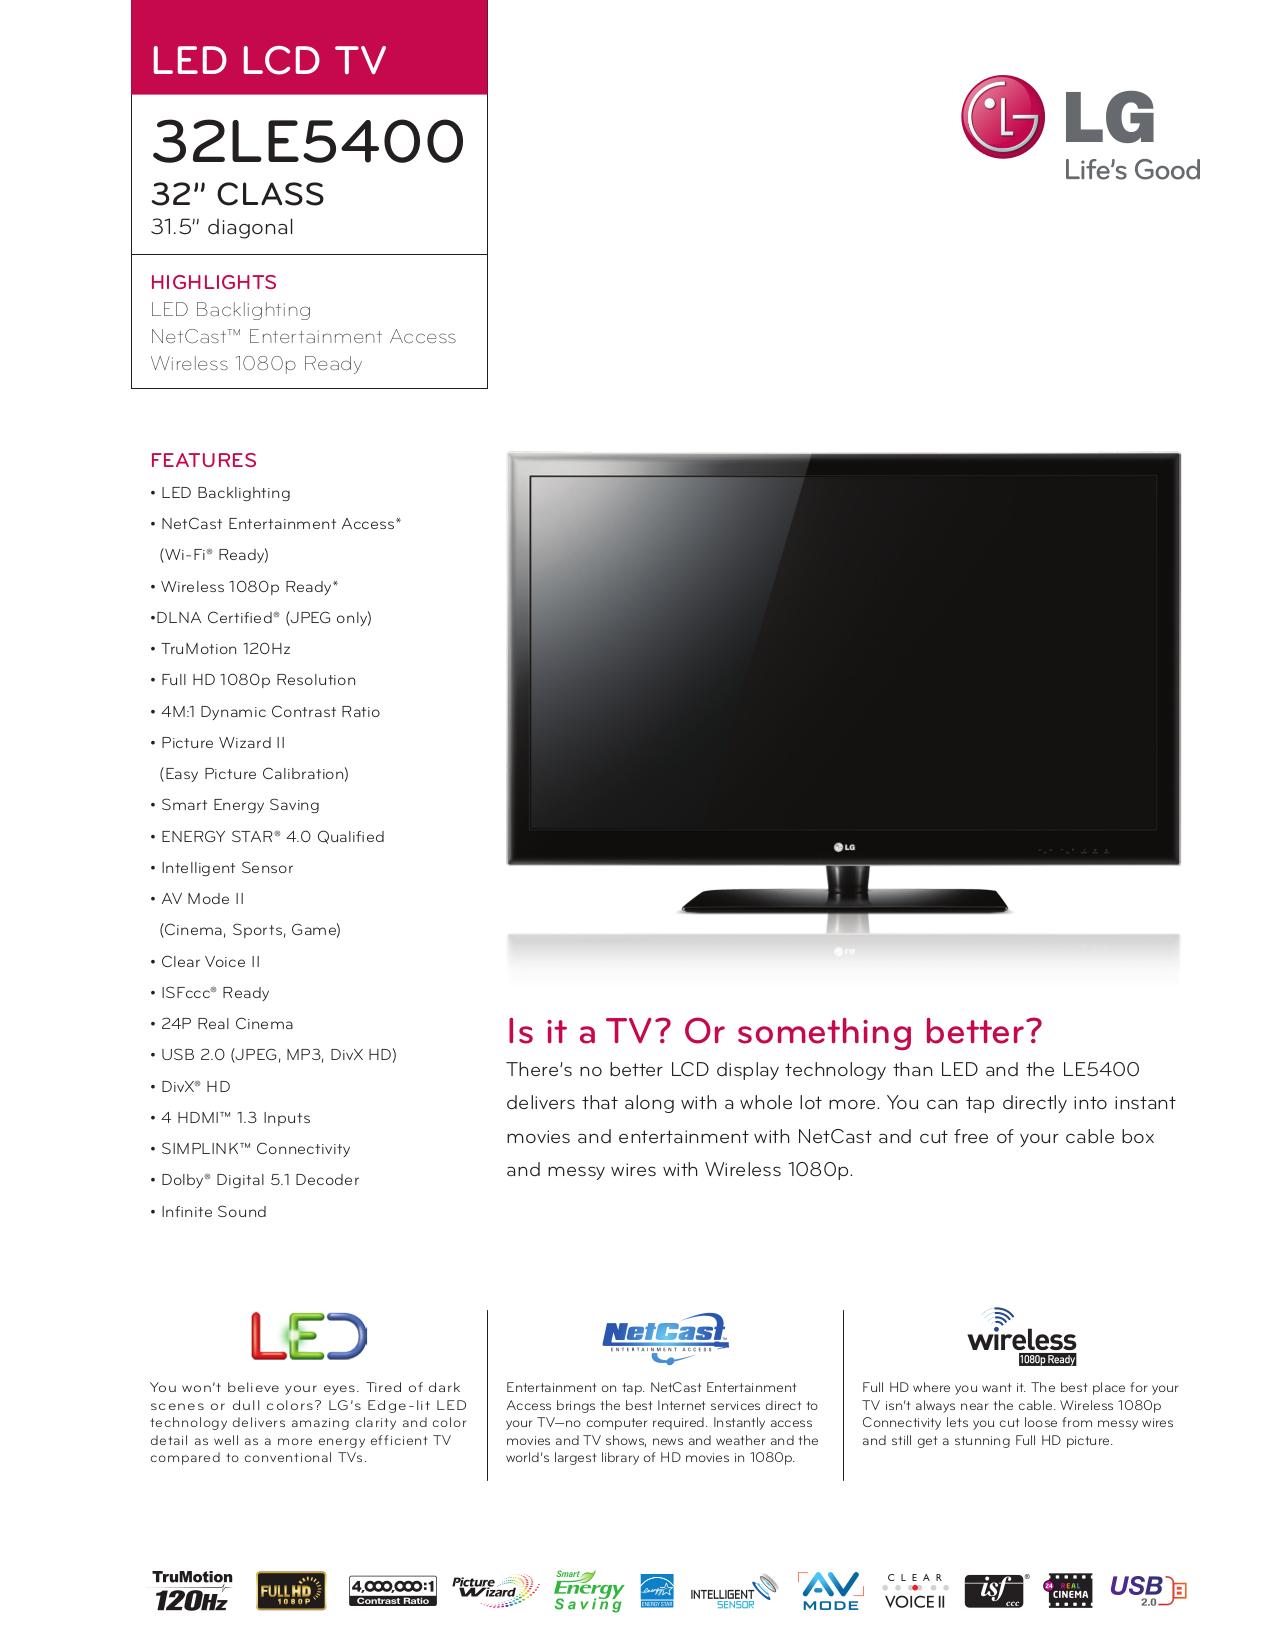 pdf for LG TV 32LE5400 manual